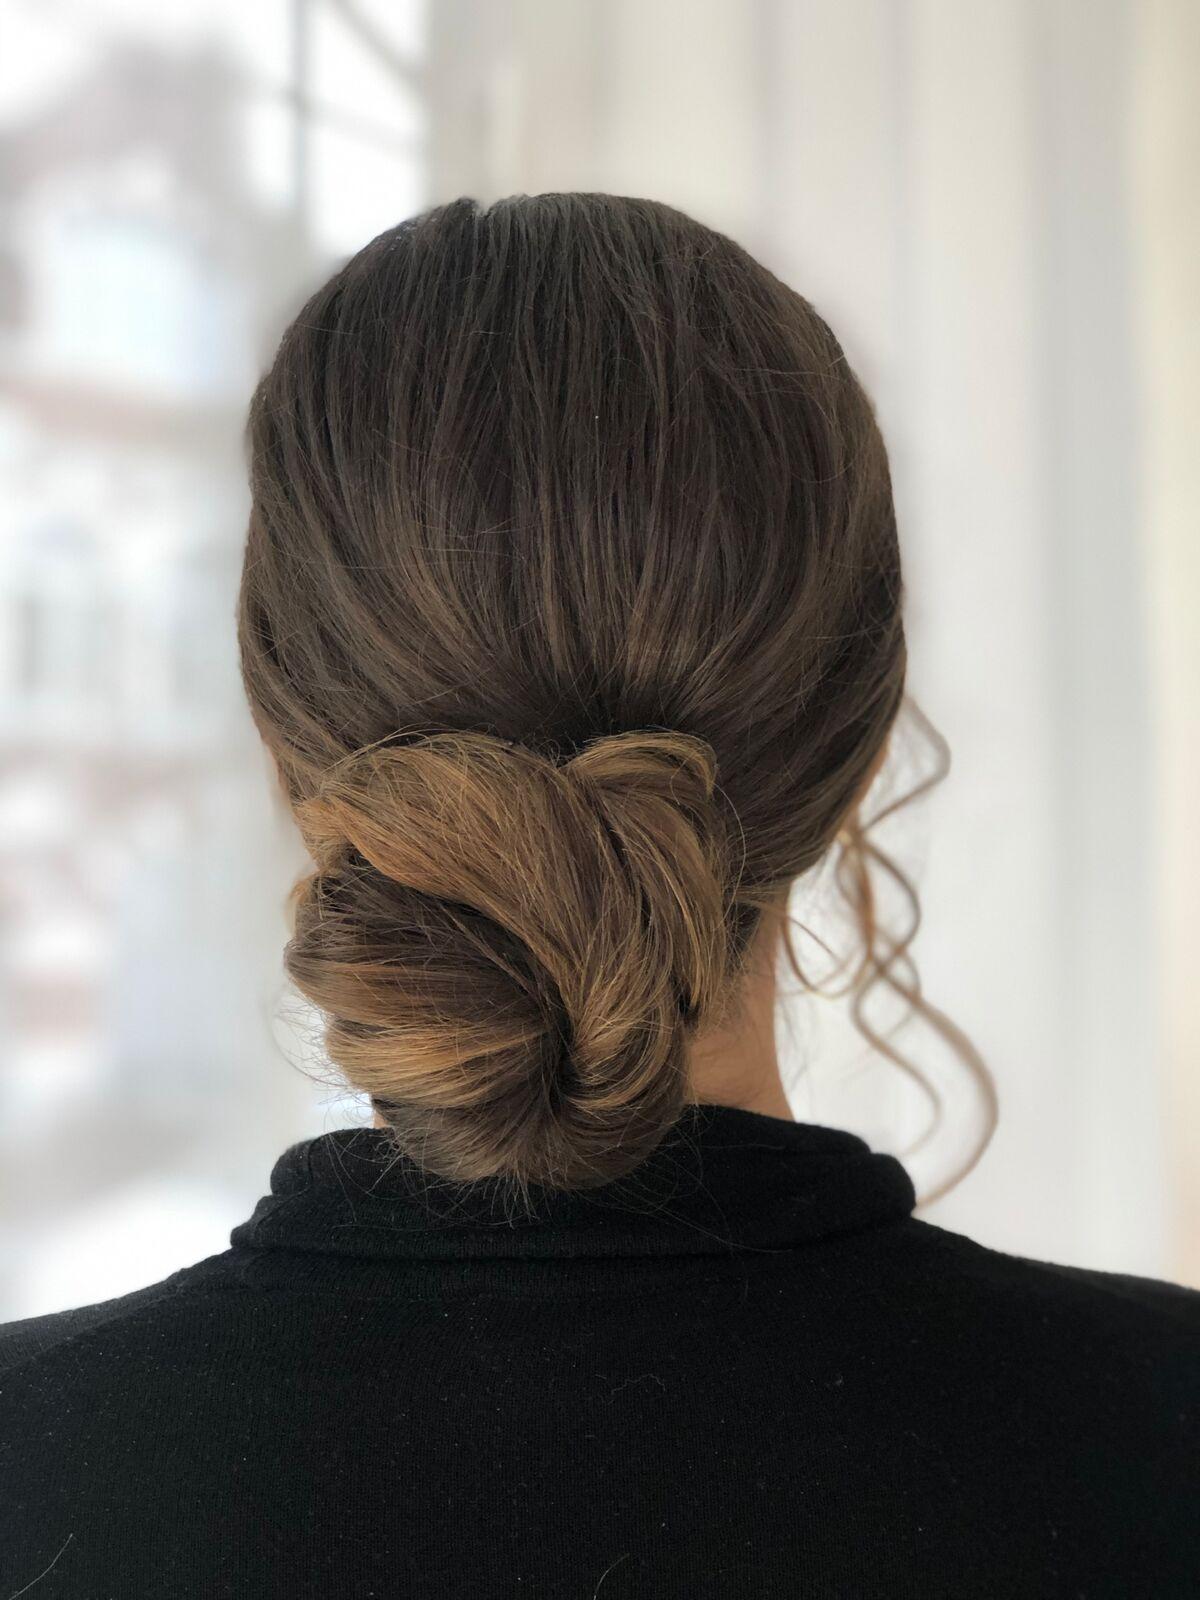 Classic-bun-hair-style-with-soft-curls- Wimbledon